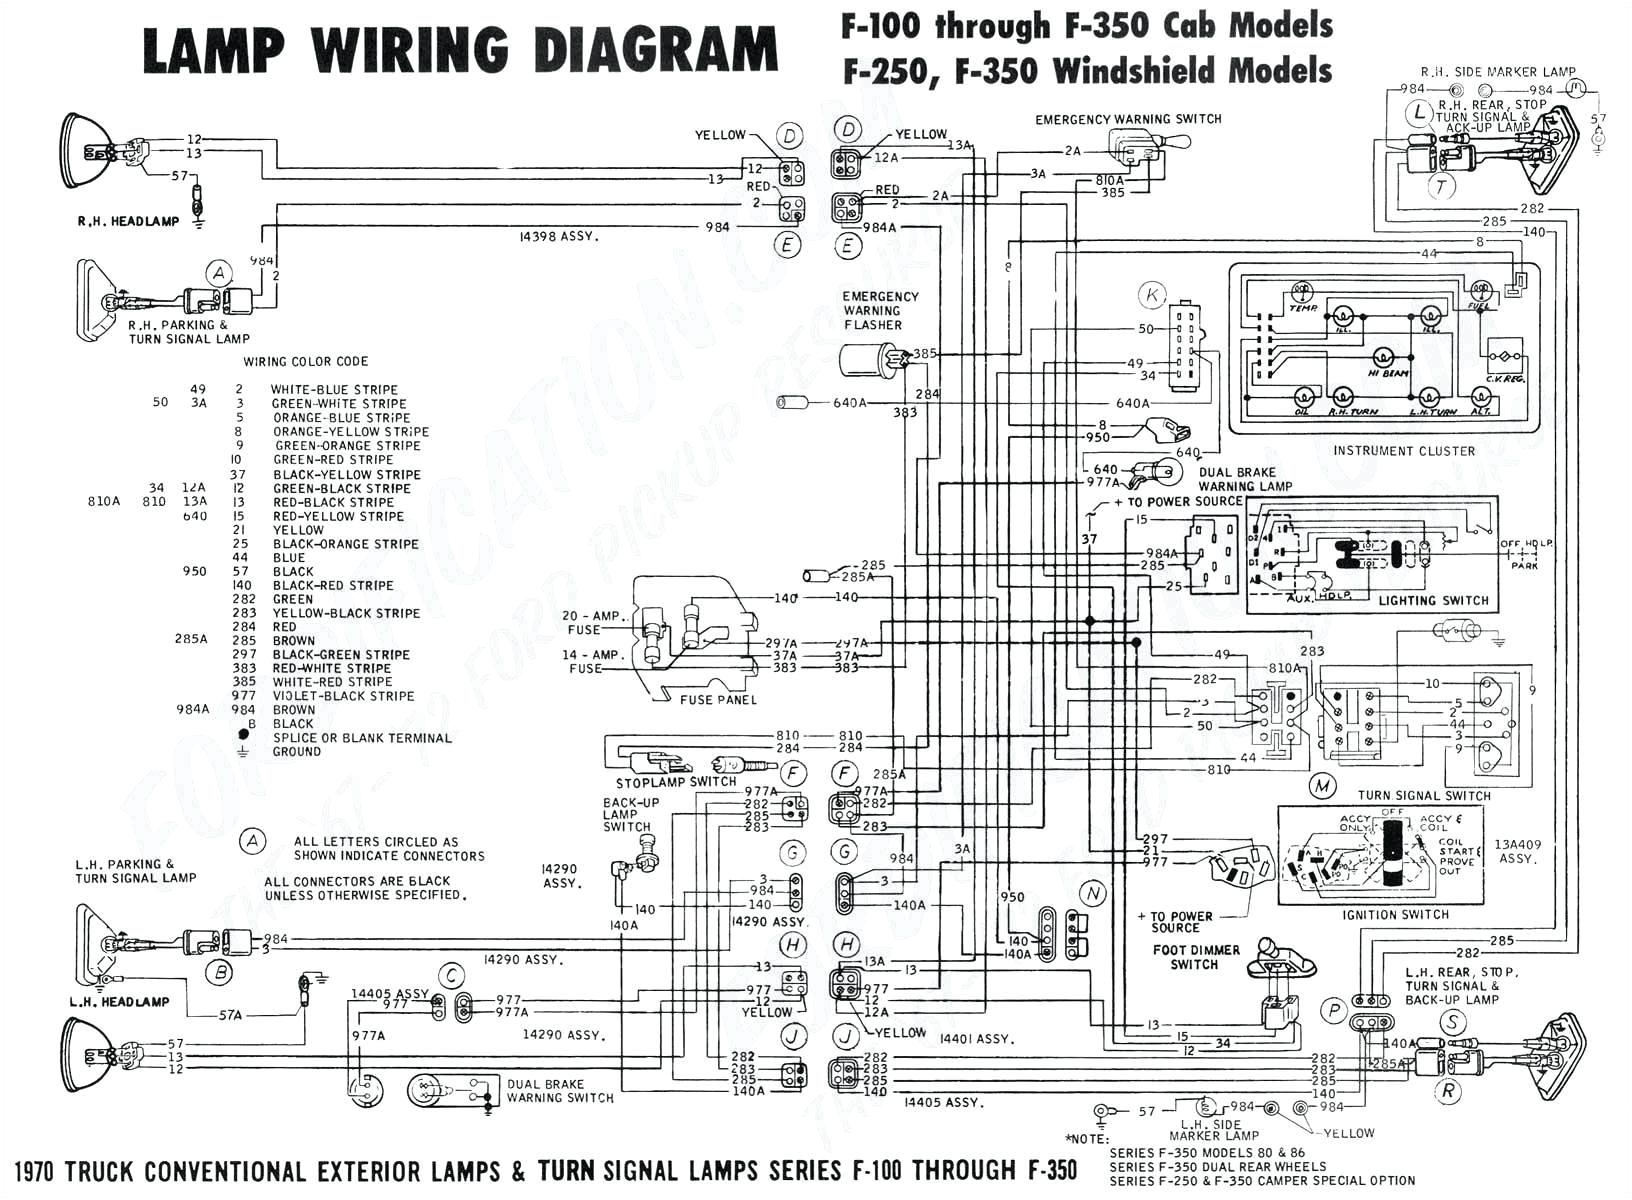 02 wrx fuse box diagram wiring diagram centre 02 wrx fuse box diagram